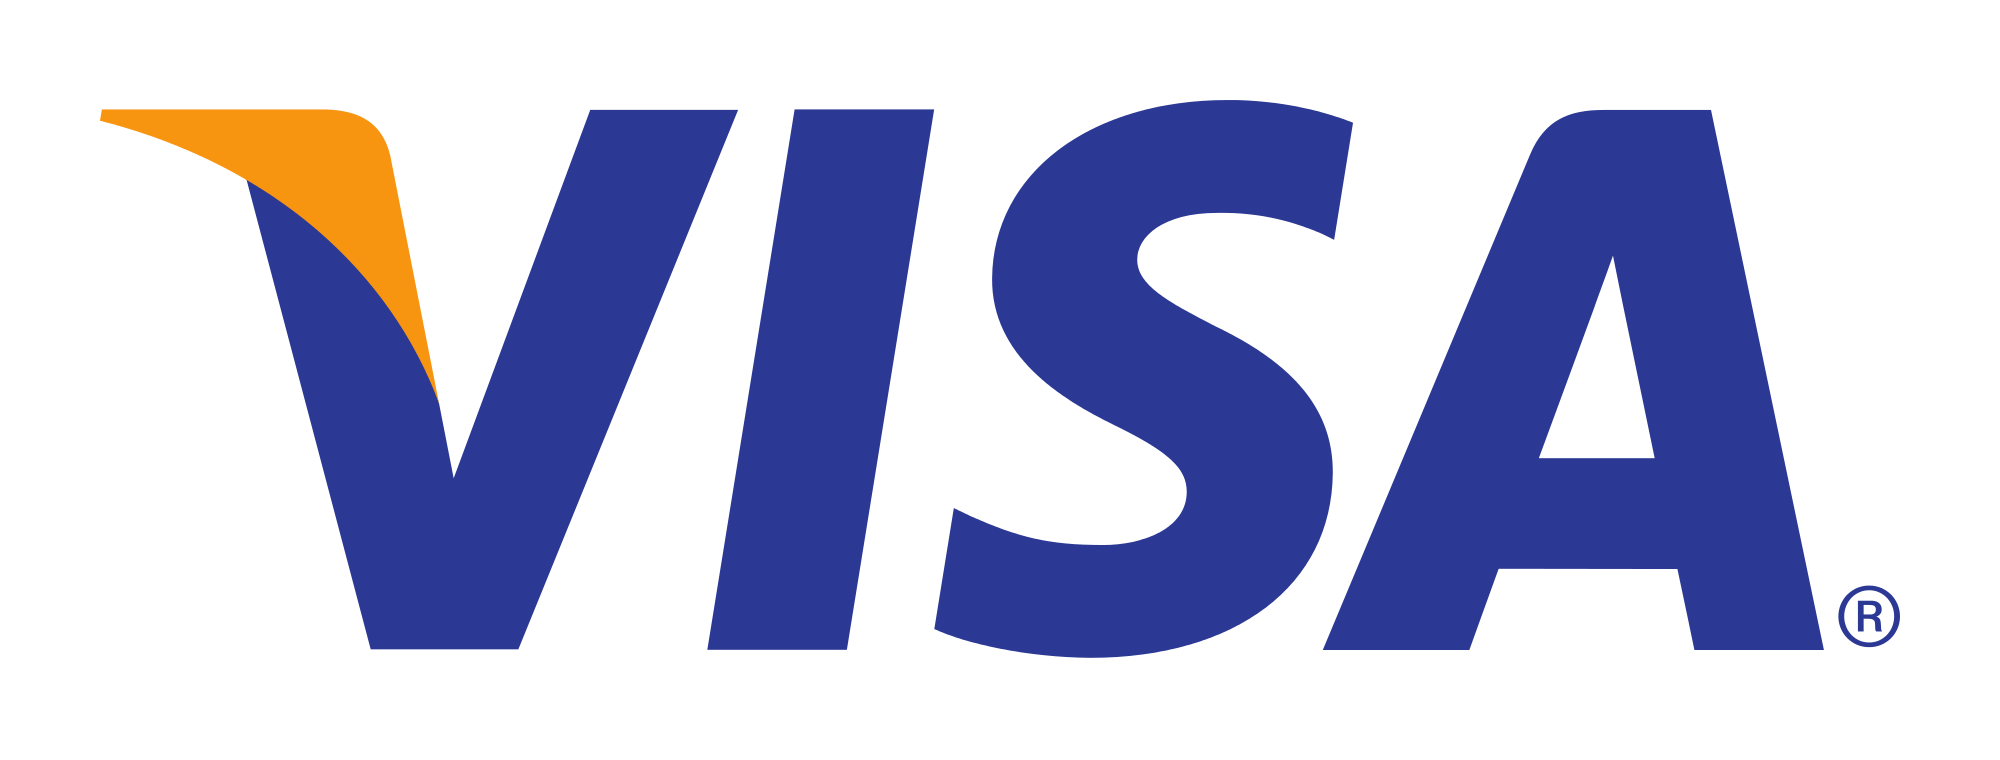 verified by visa logo png #2013